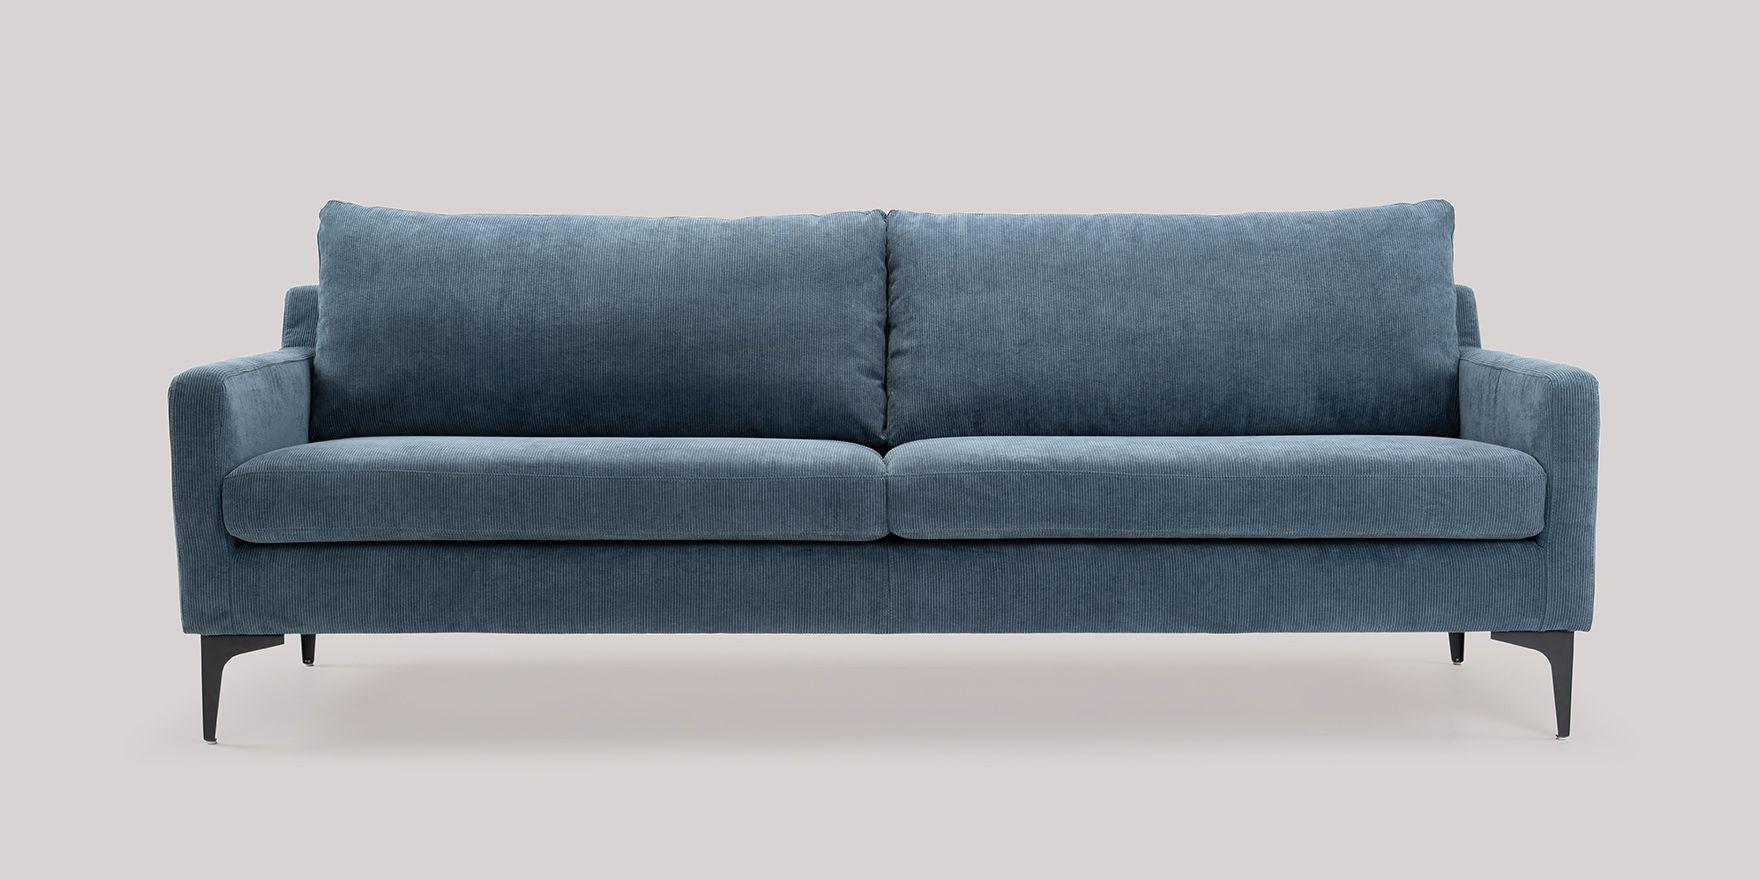 Full Size of Sofa Blau In L Form Himolla Auf Raten Abnehmbarer Bezug Cognac Eck Franz Fertig Garnitur 3 Teilig München Günstig Kaufen Mit Schlaffunktion Tom Tailor Sofa Sofa Blau